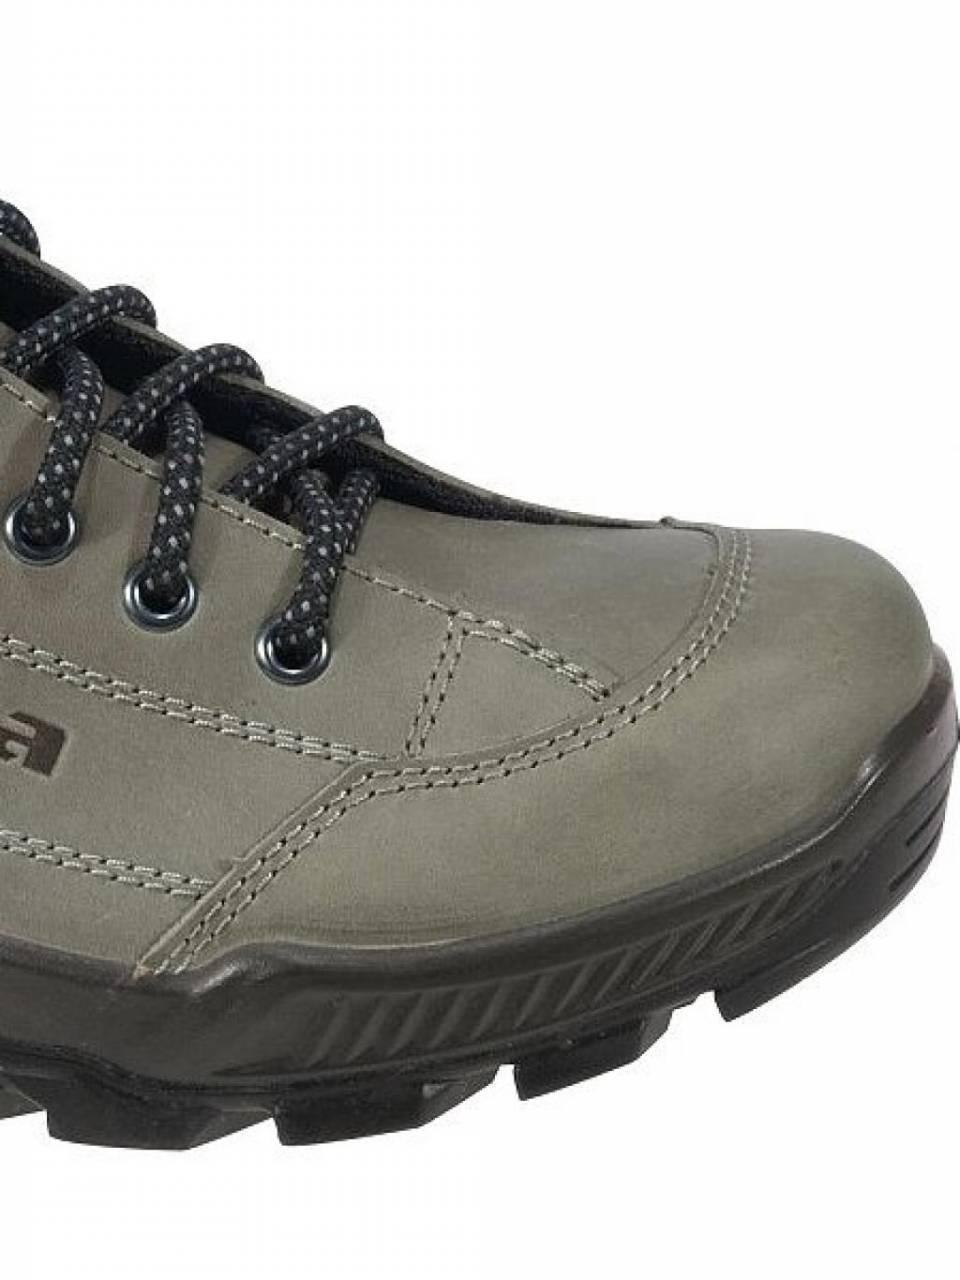 e5e4bccd29e ALPINA Туристически обувки Ohio. производител: ALPINA ...